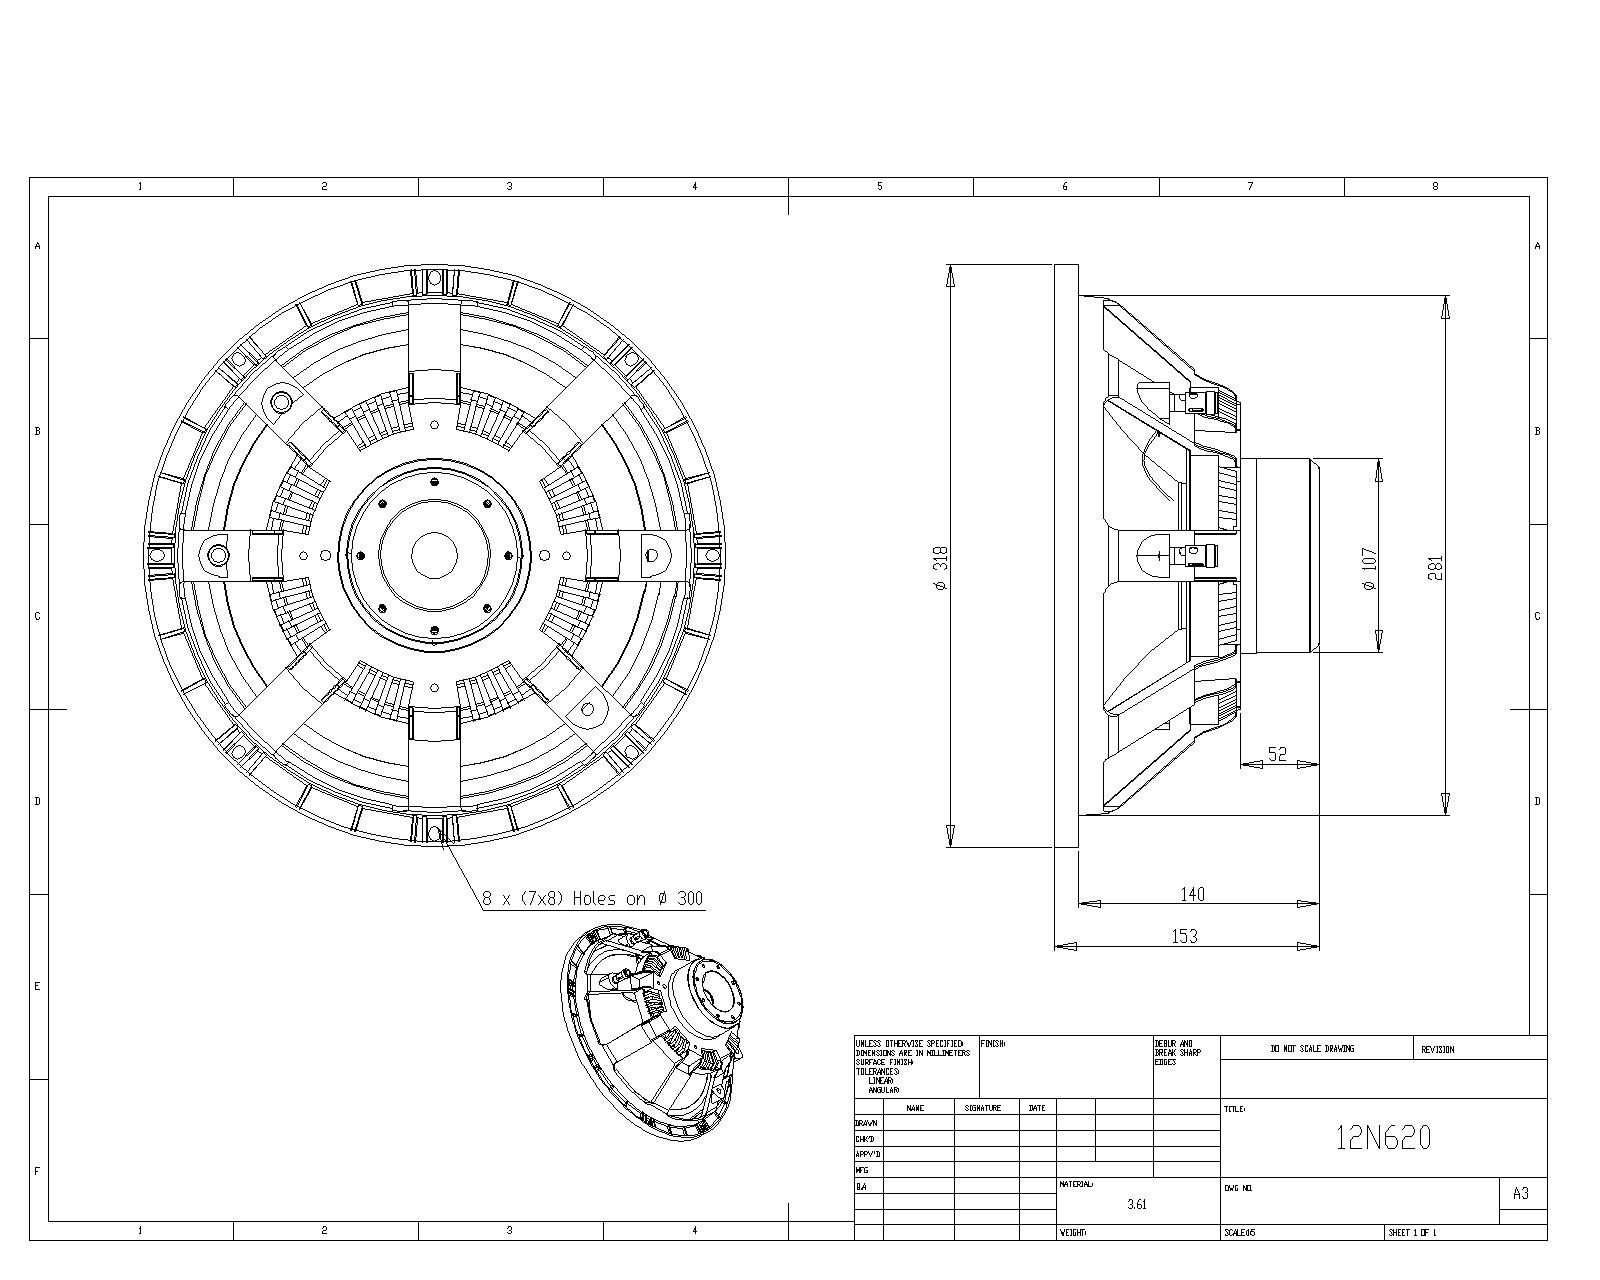 1600x1280 Drawing Amp Mounting